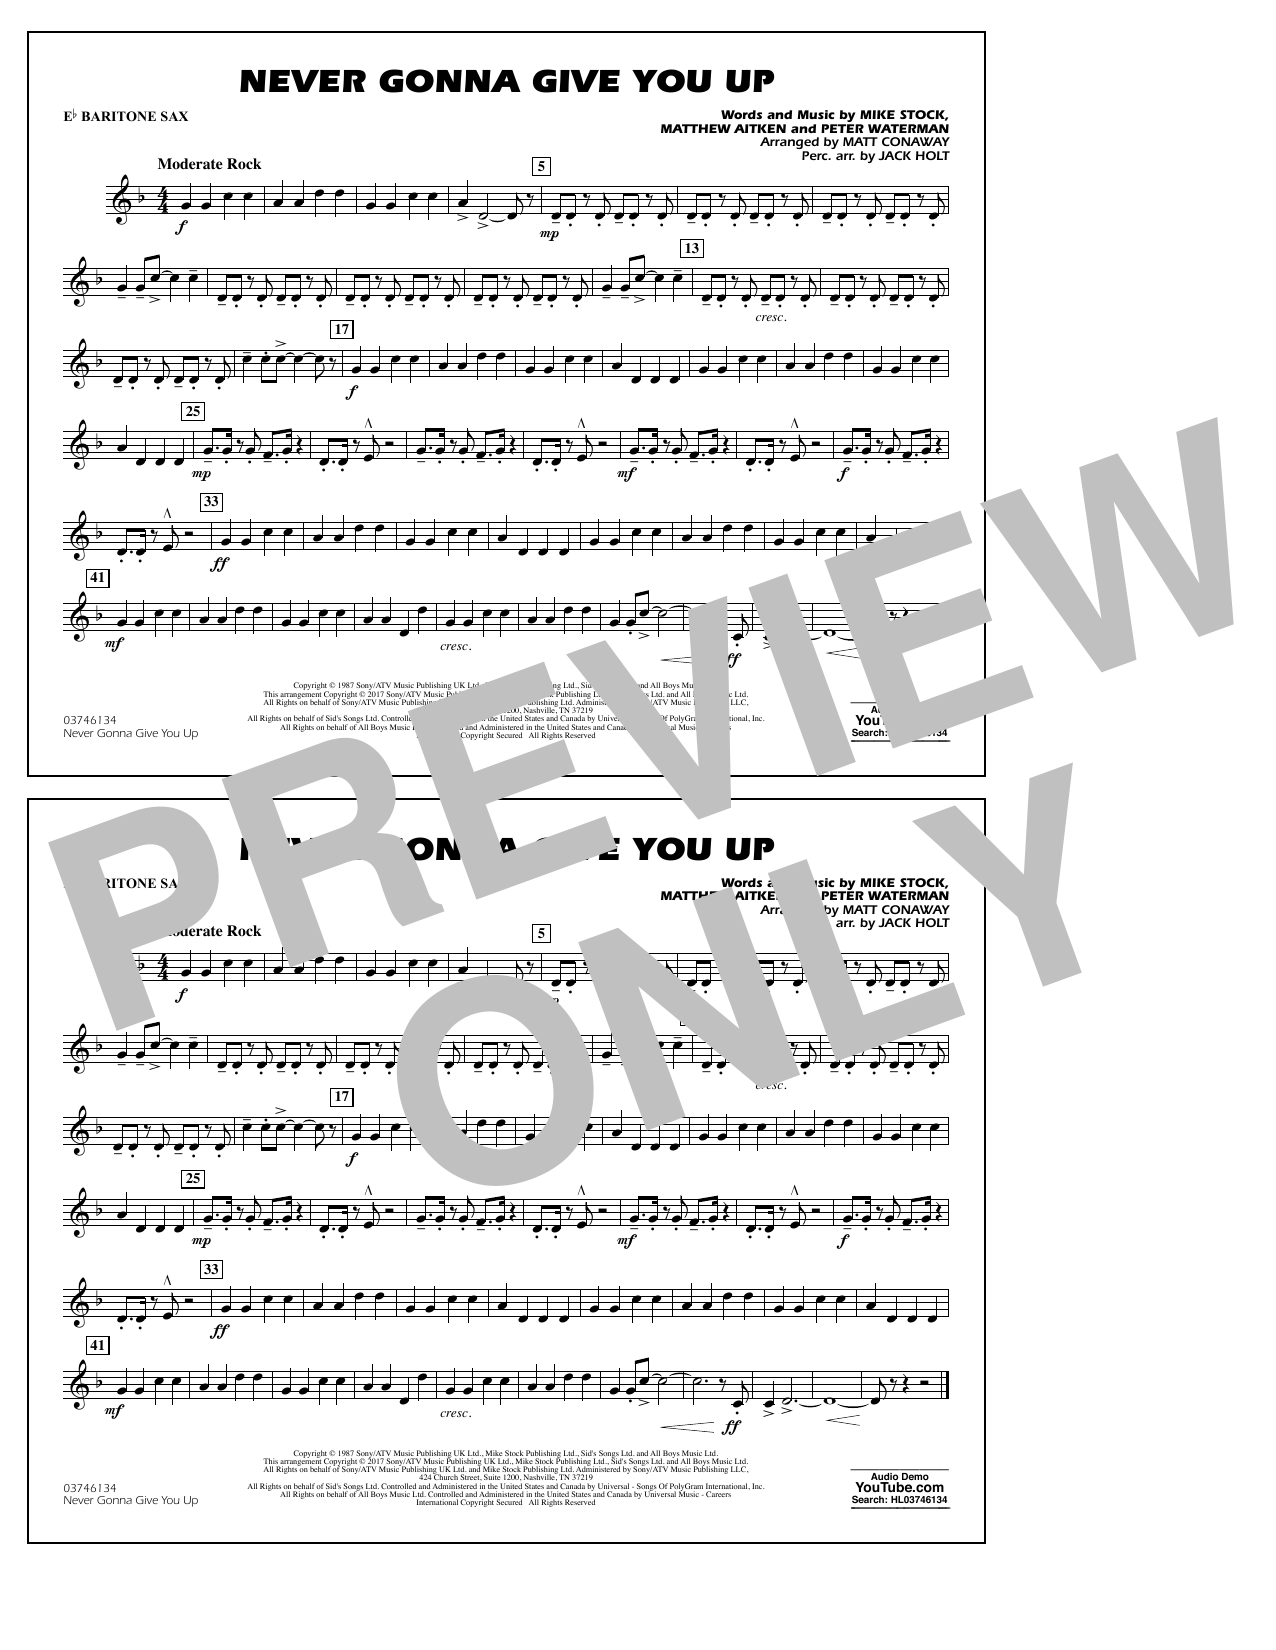 Never Gonna Give You Up - Eb Baritone Sax Sheet Music